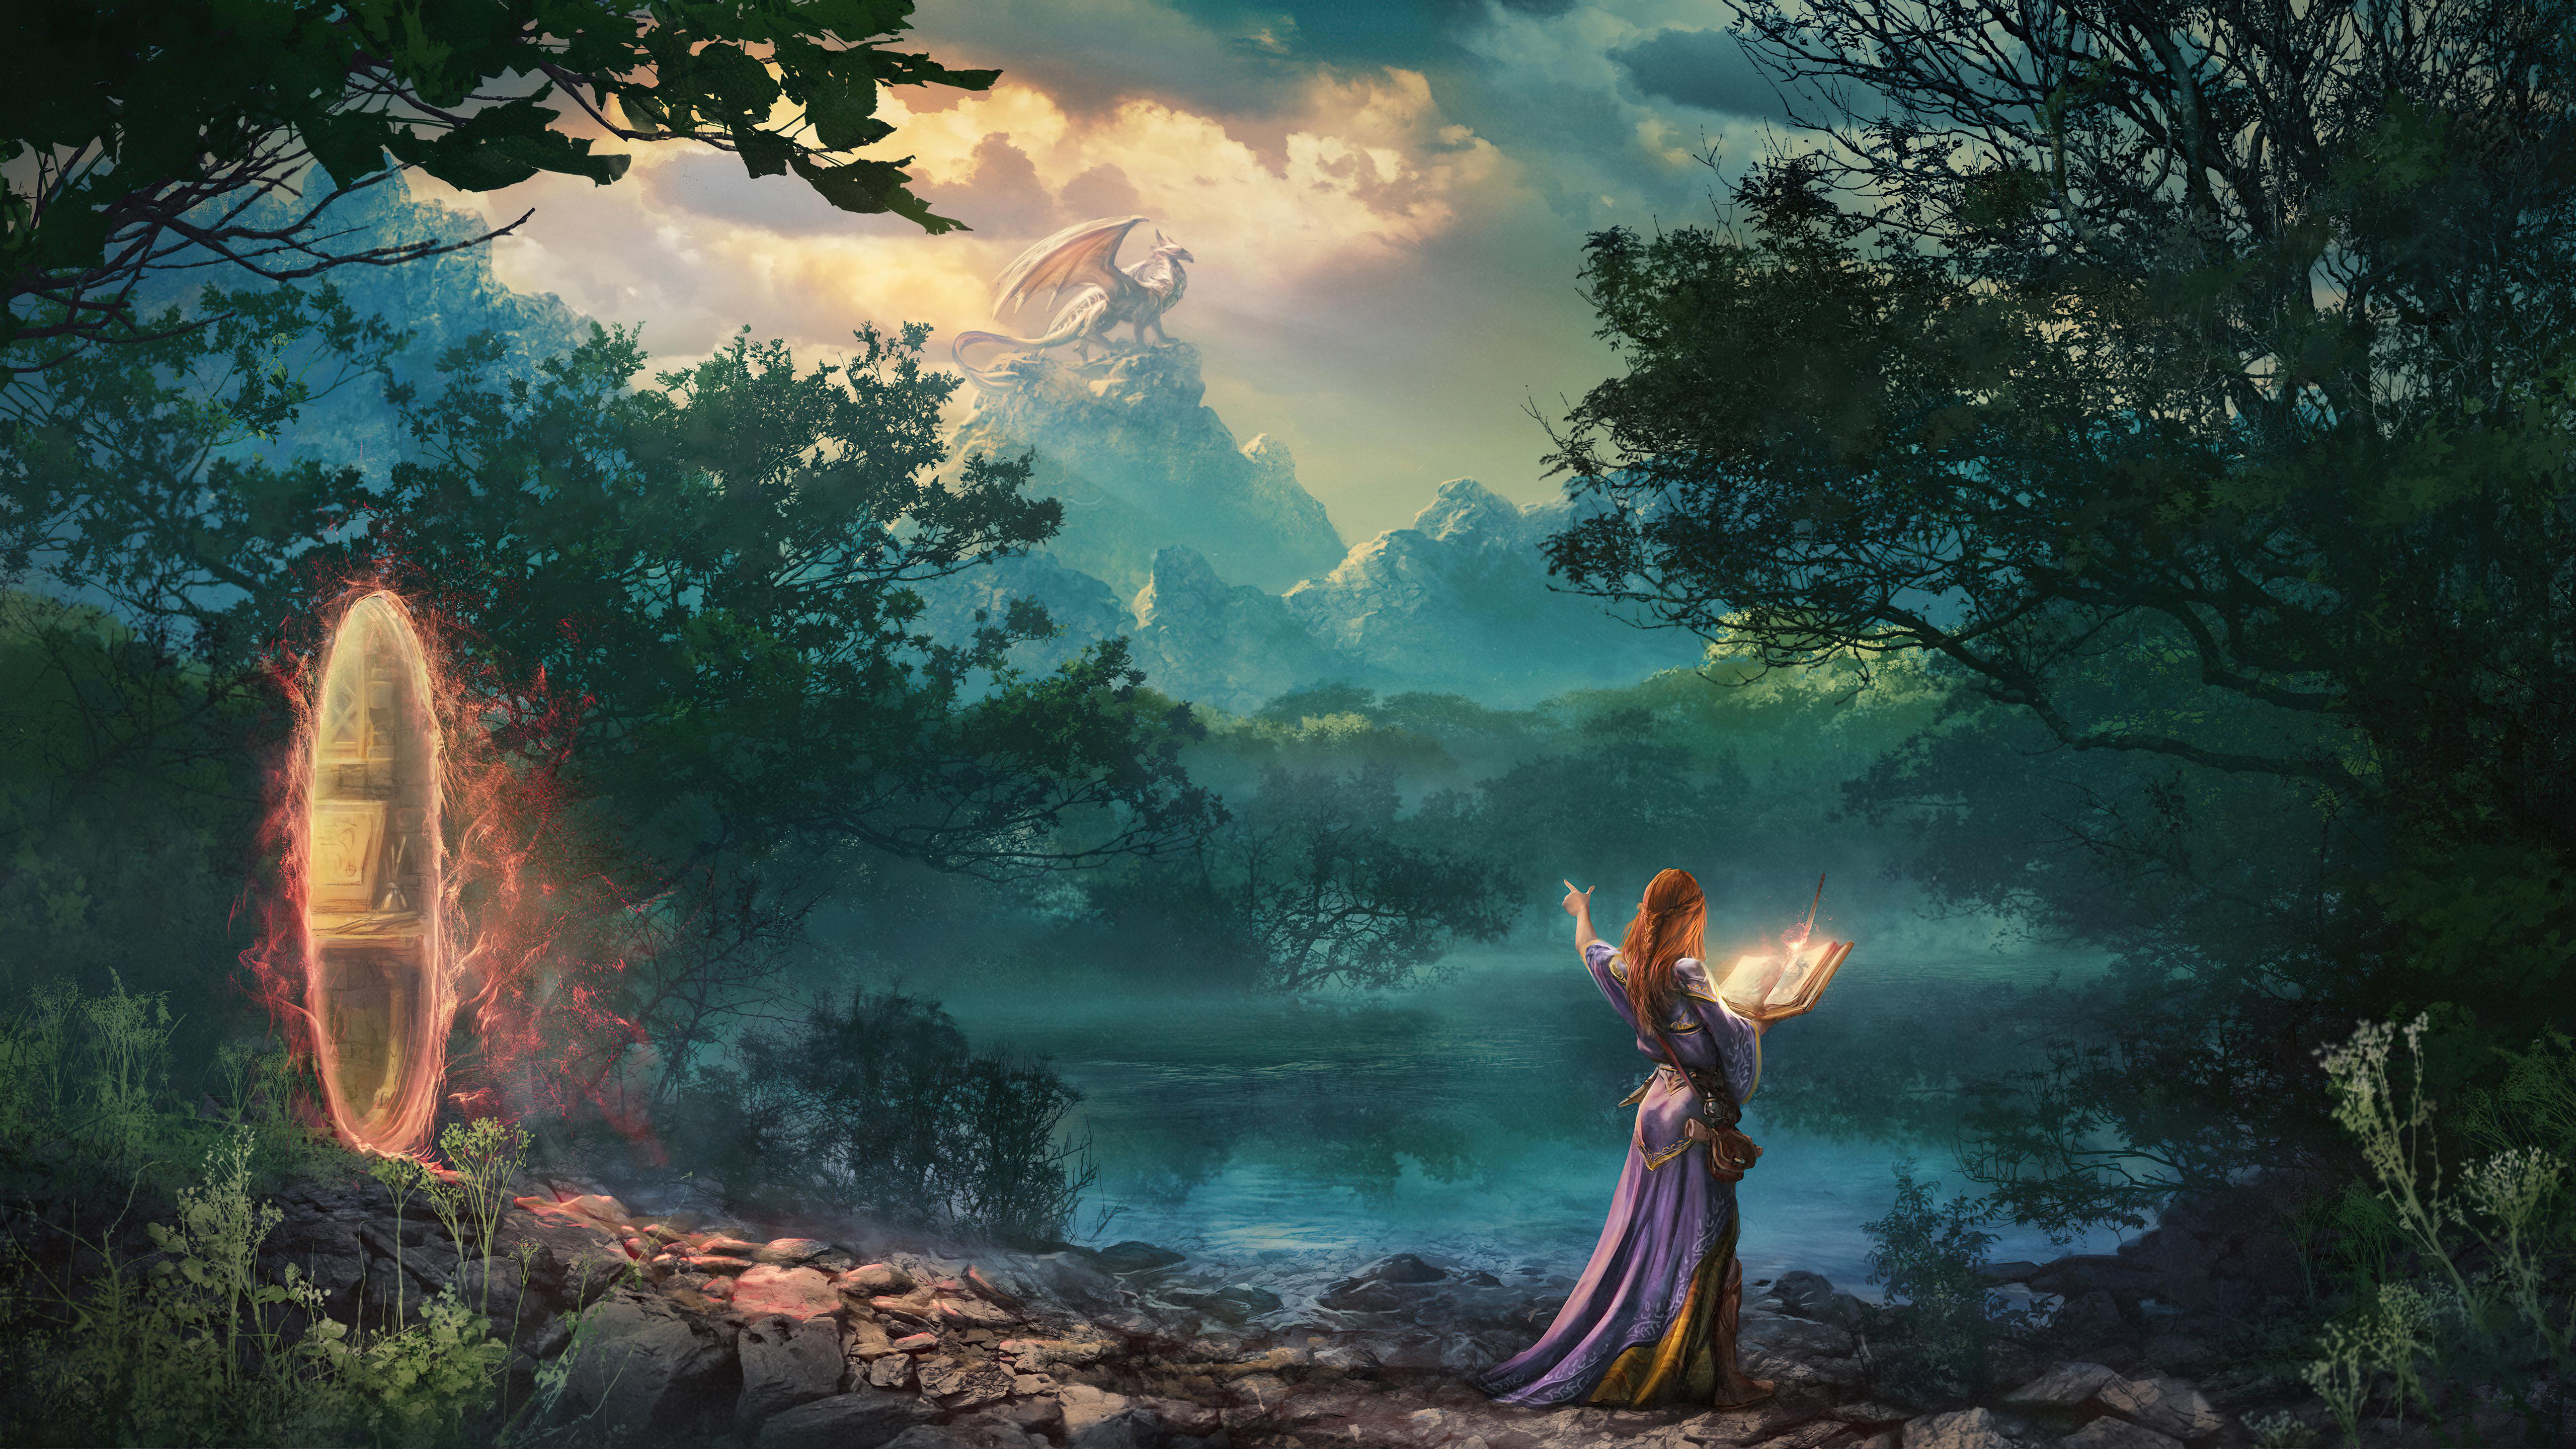 the magic brush dragon priest 4k 1618130520 - The Magic Brush Dragon Priest 4k - The Magic Brush Dragon Priest 4k wallpapers